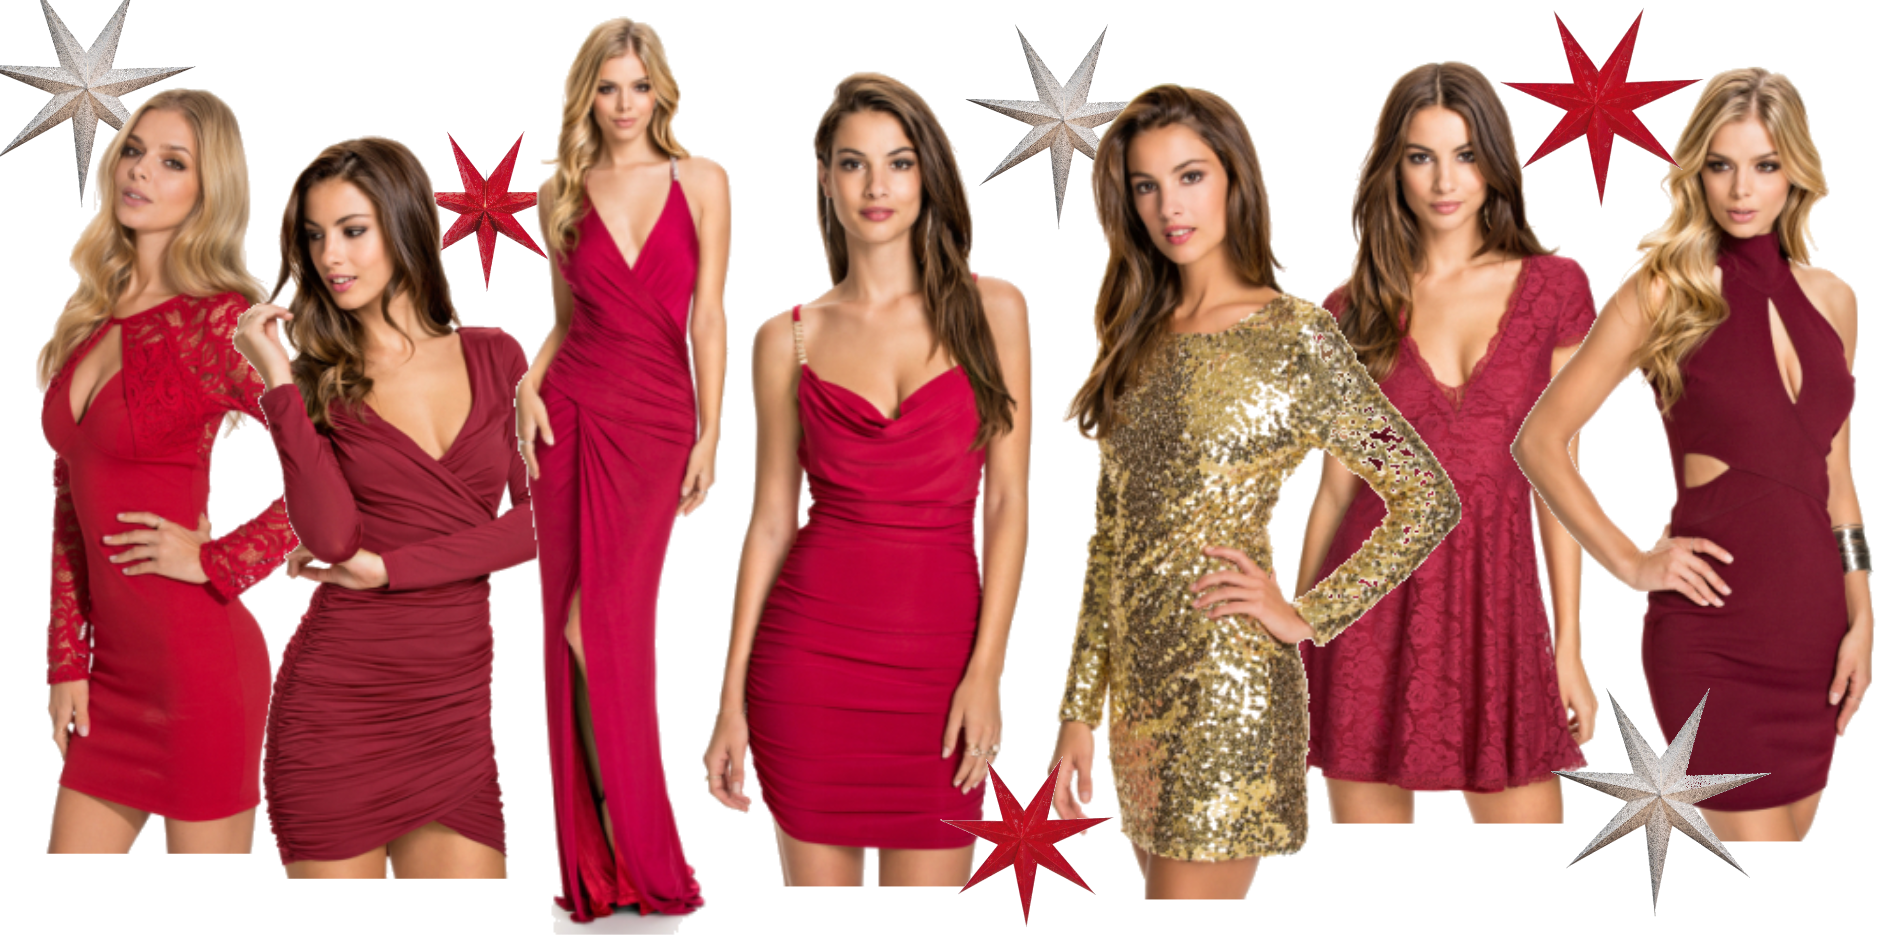 Xmas dresses